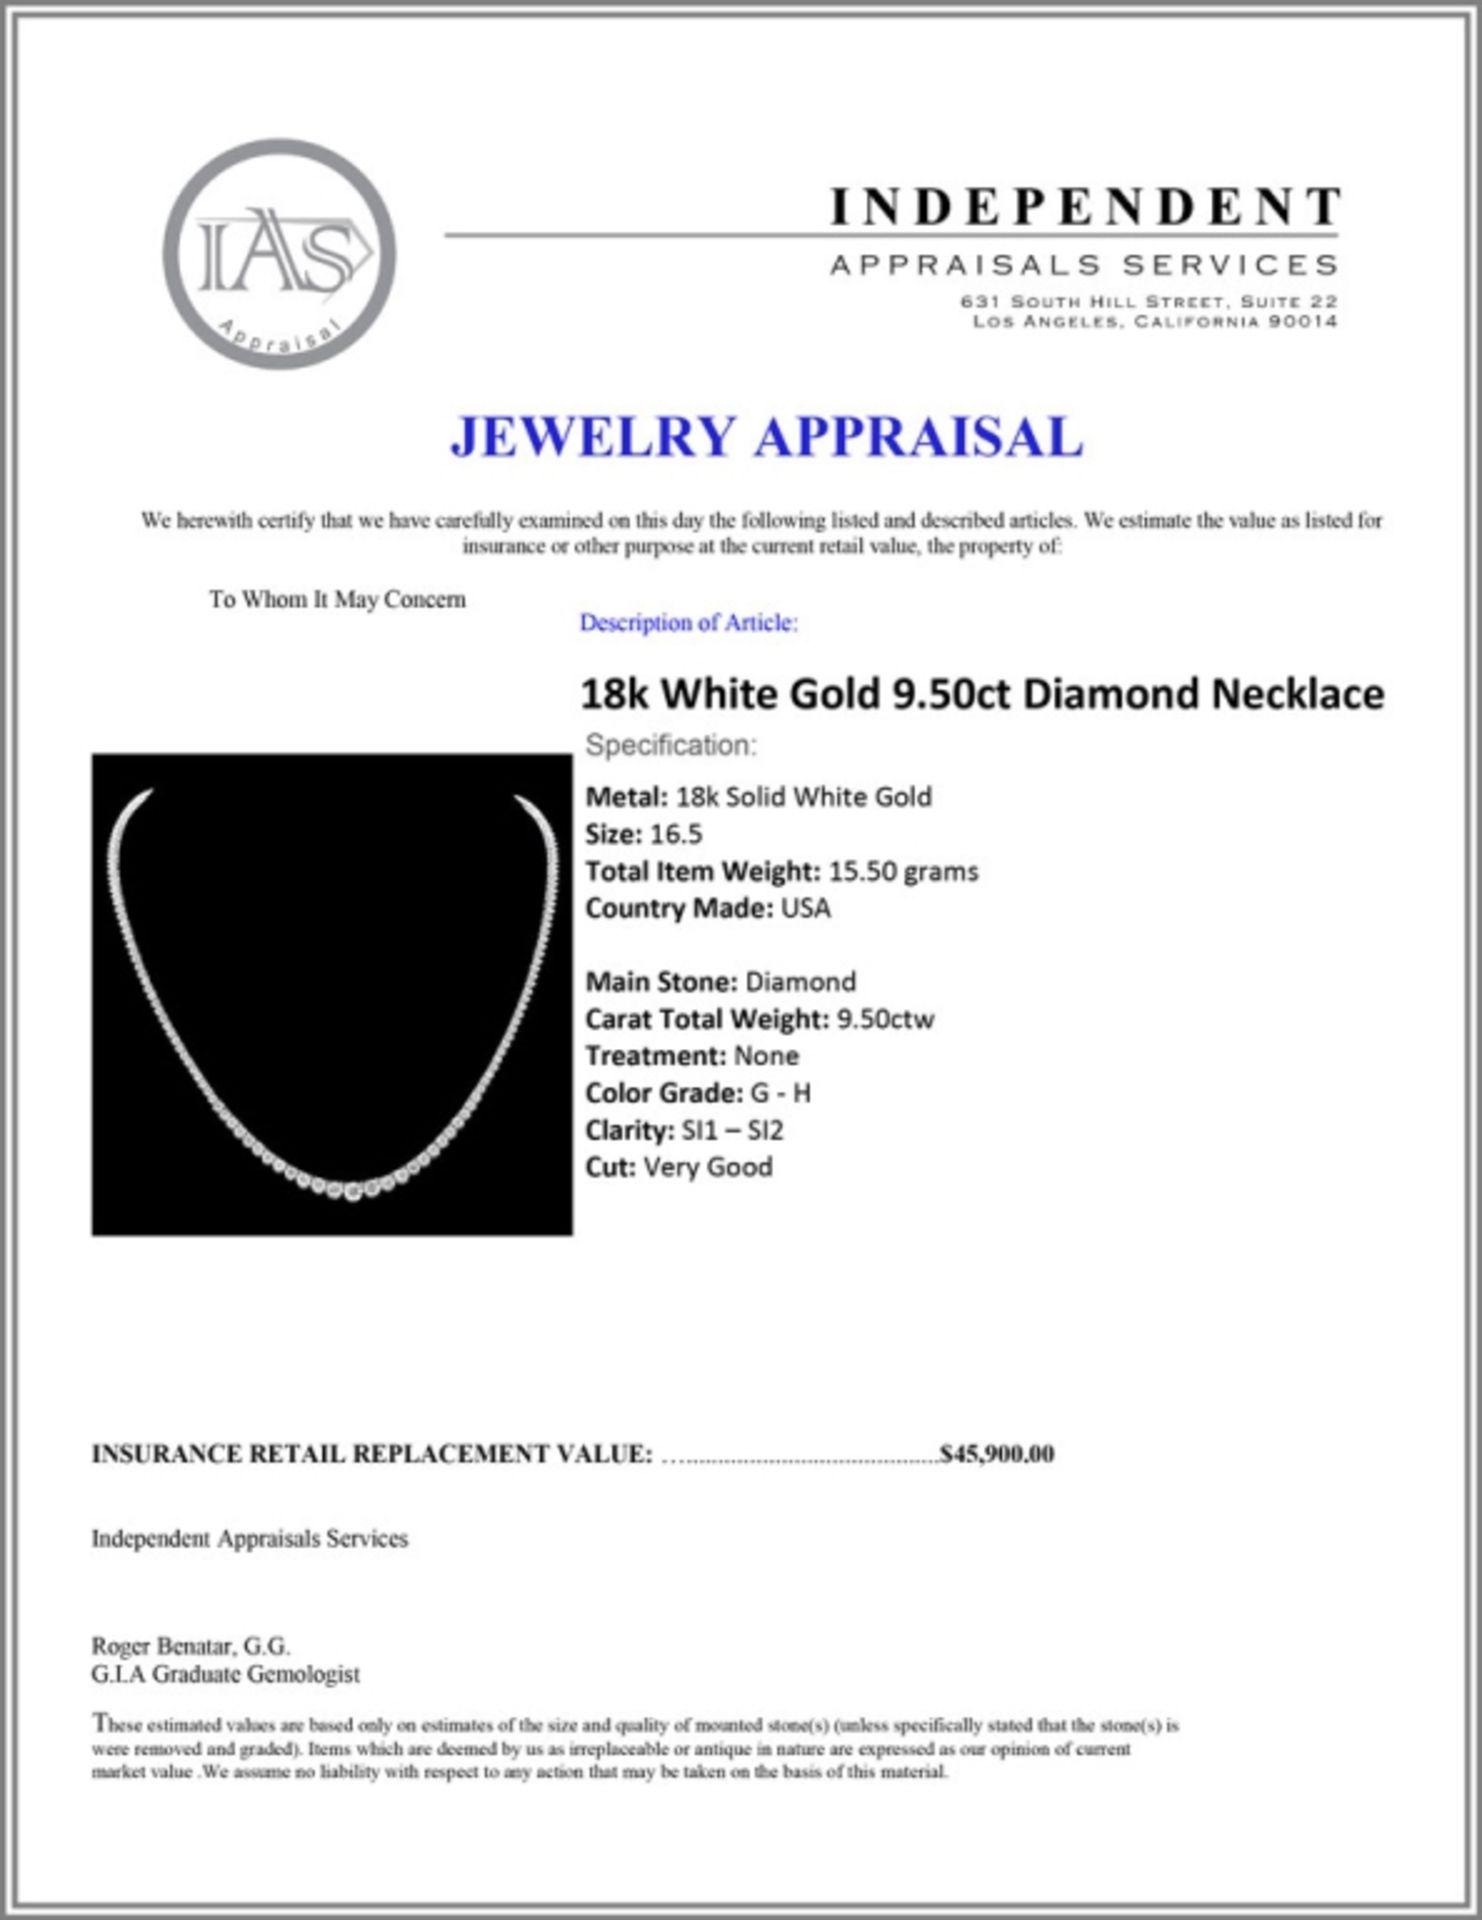 18k White Gold 9.50ct Diamond Necklace - Image 5 of 5